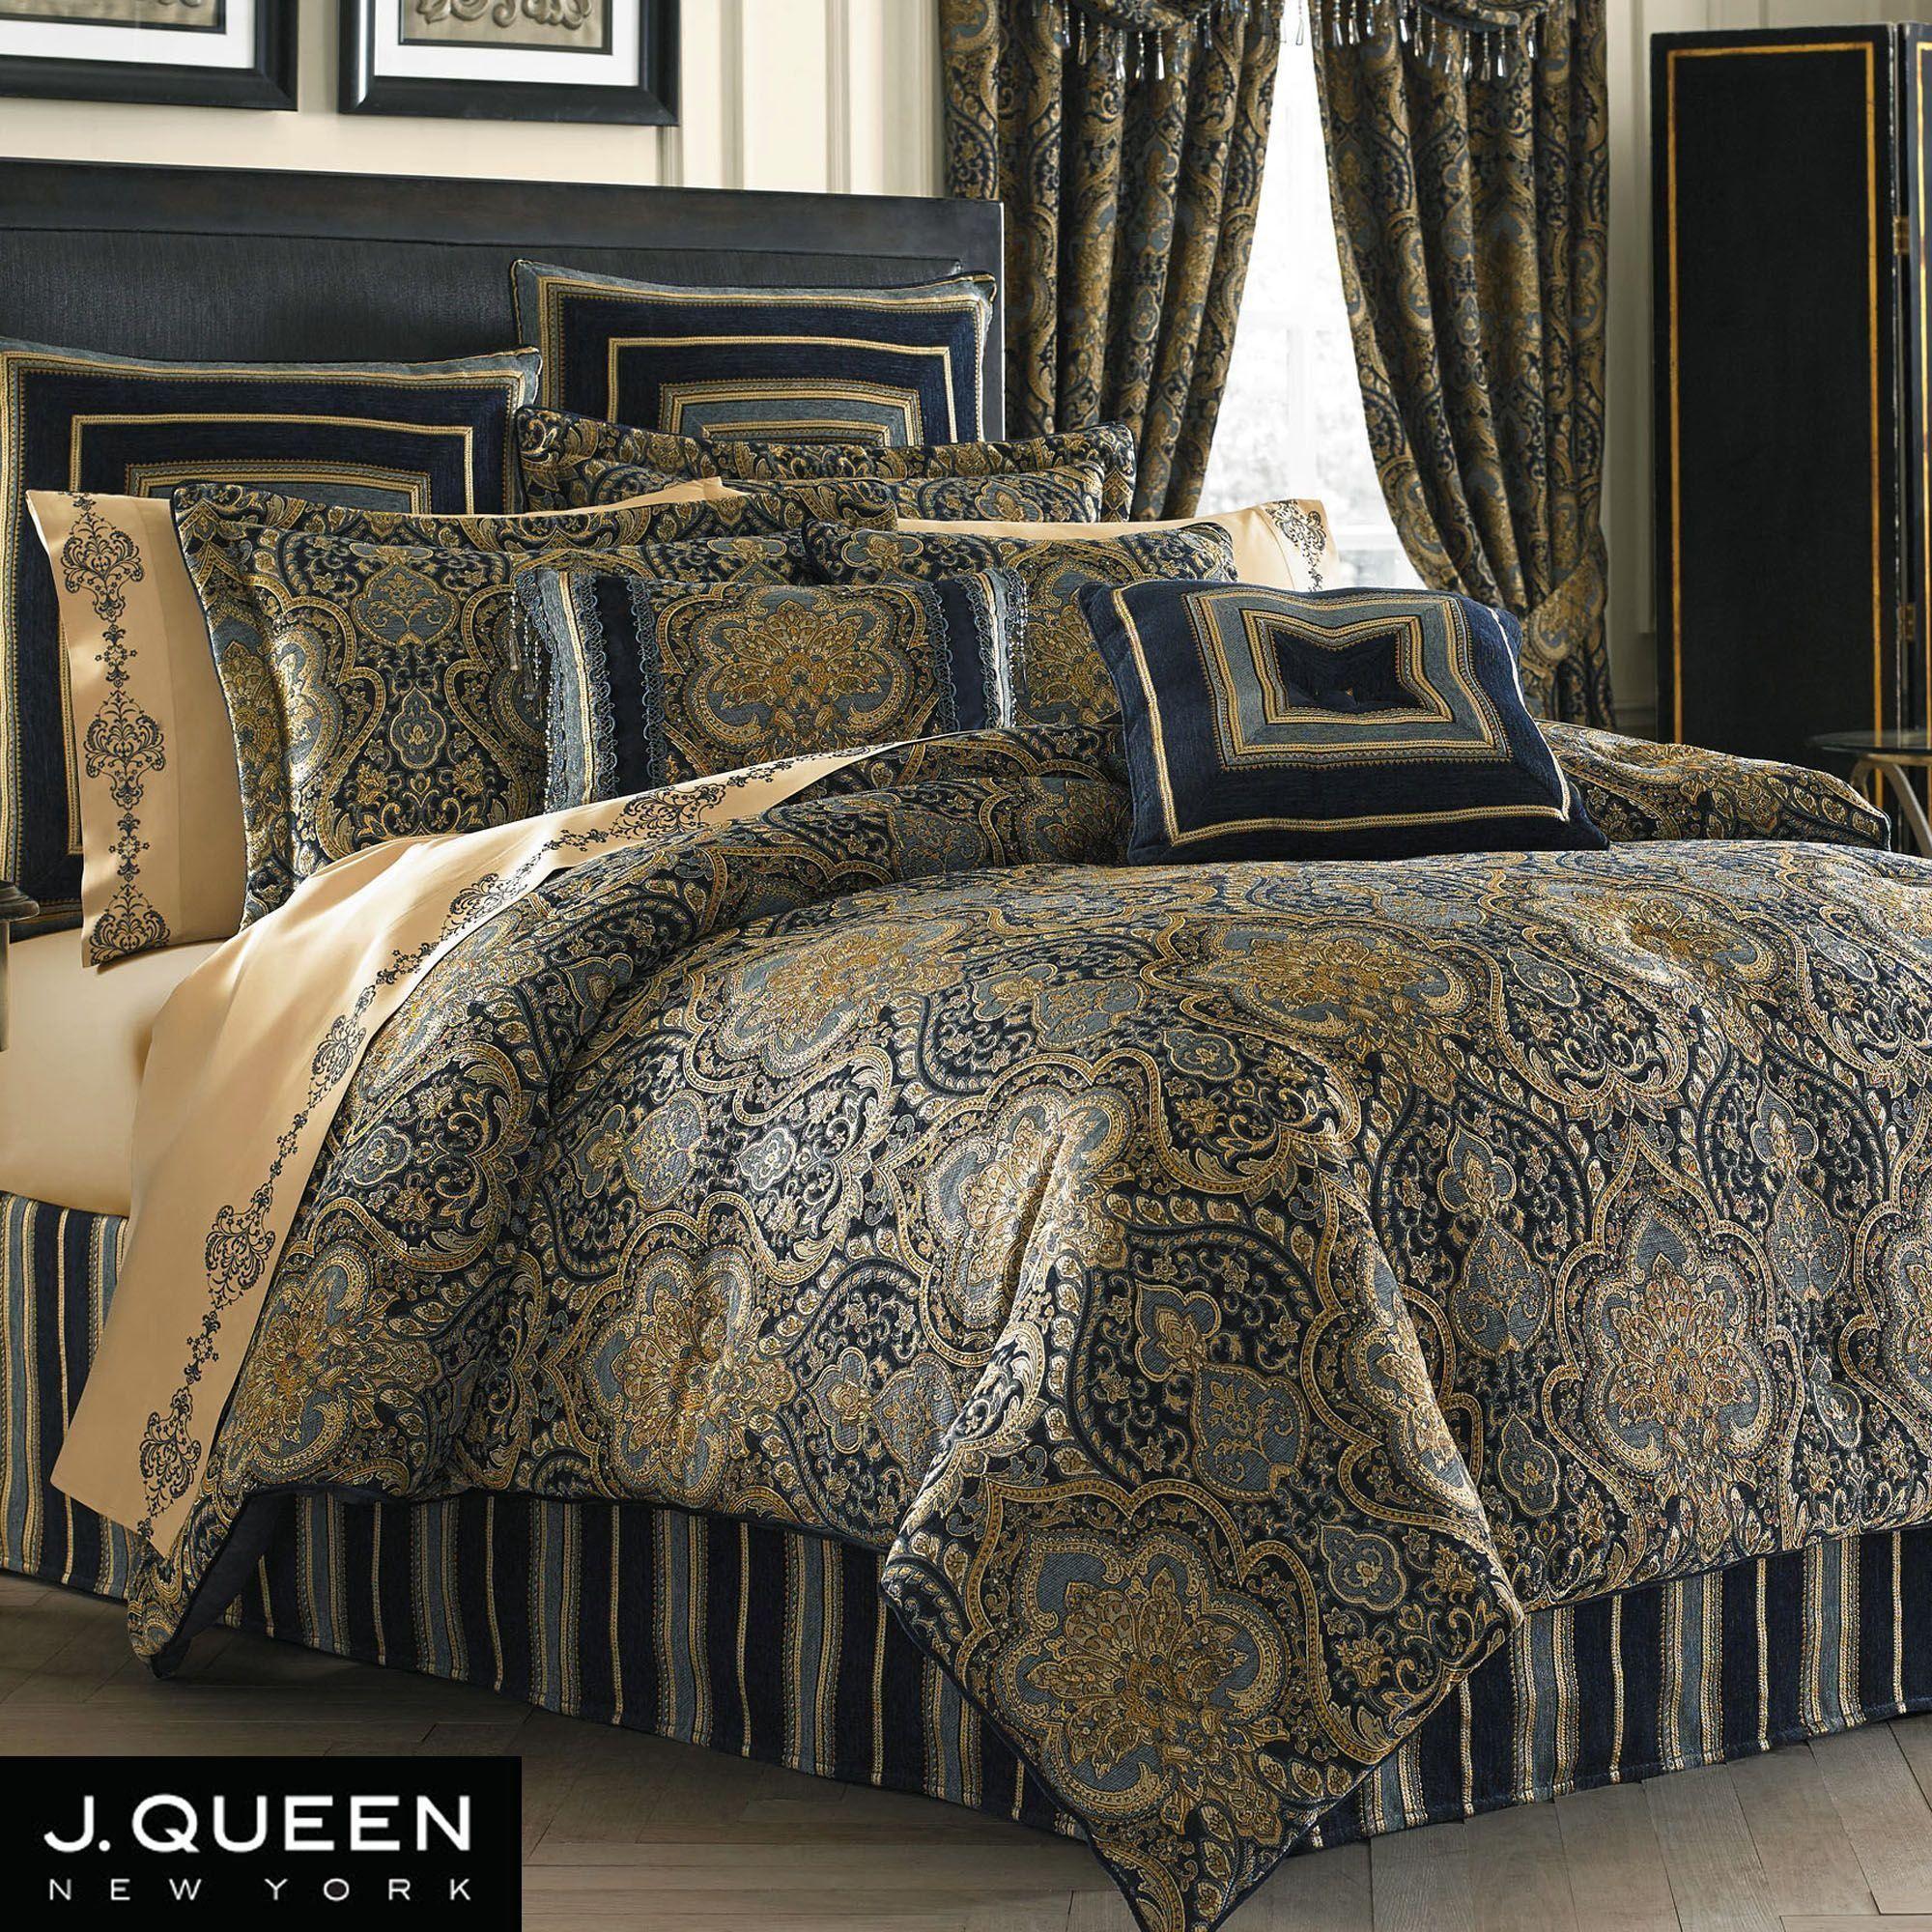 kids bedroom blue coordinating marvelous mainstays comforter queen piece in bedding sets on robots size sheets quilt towels full set bag amusing